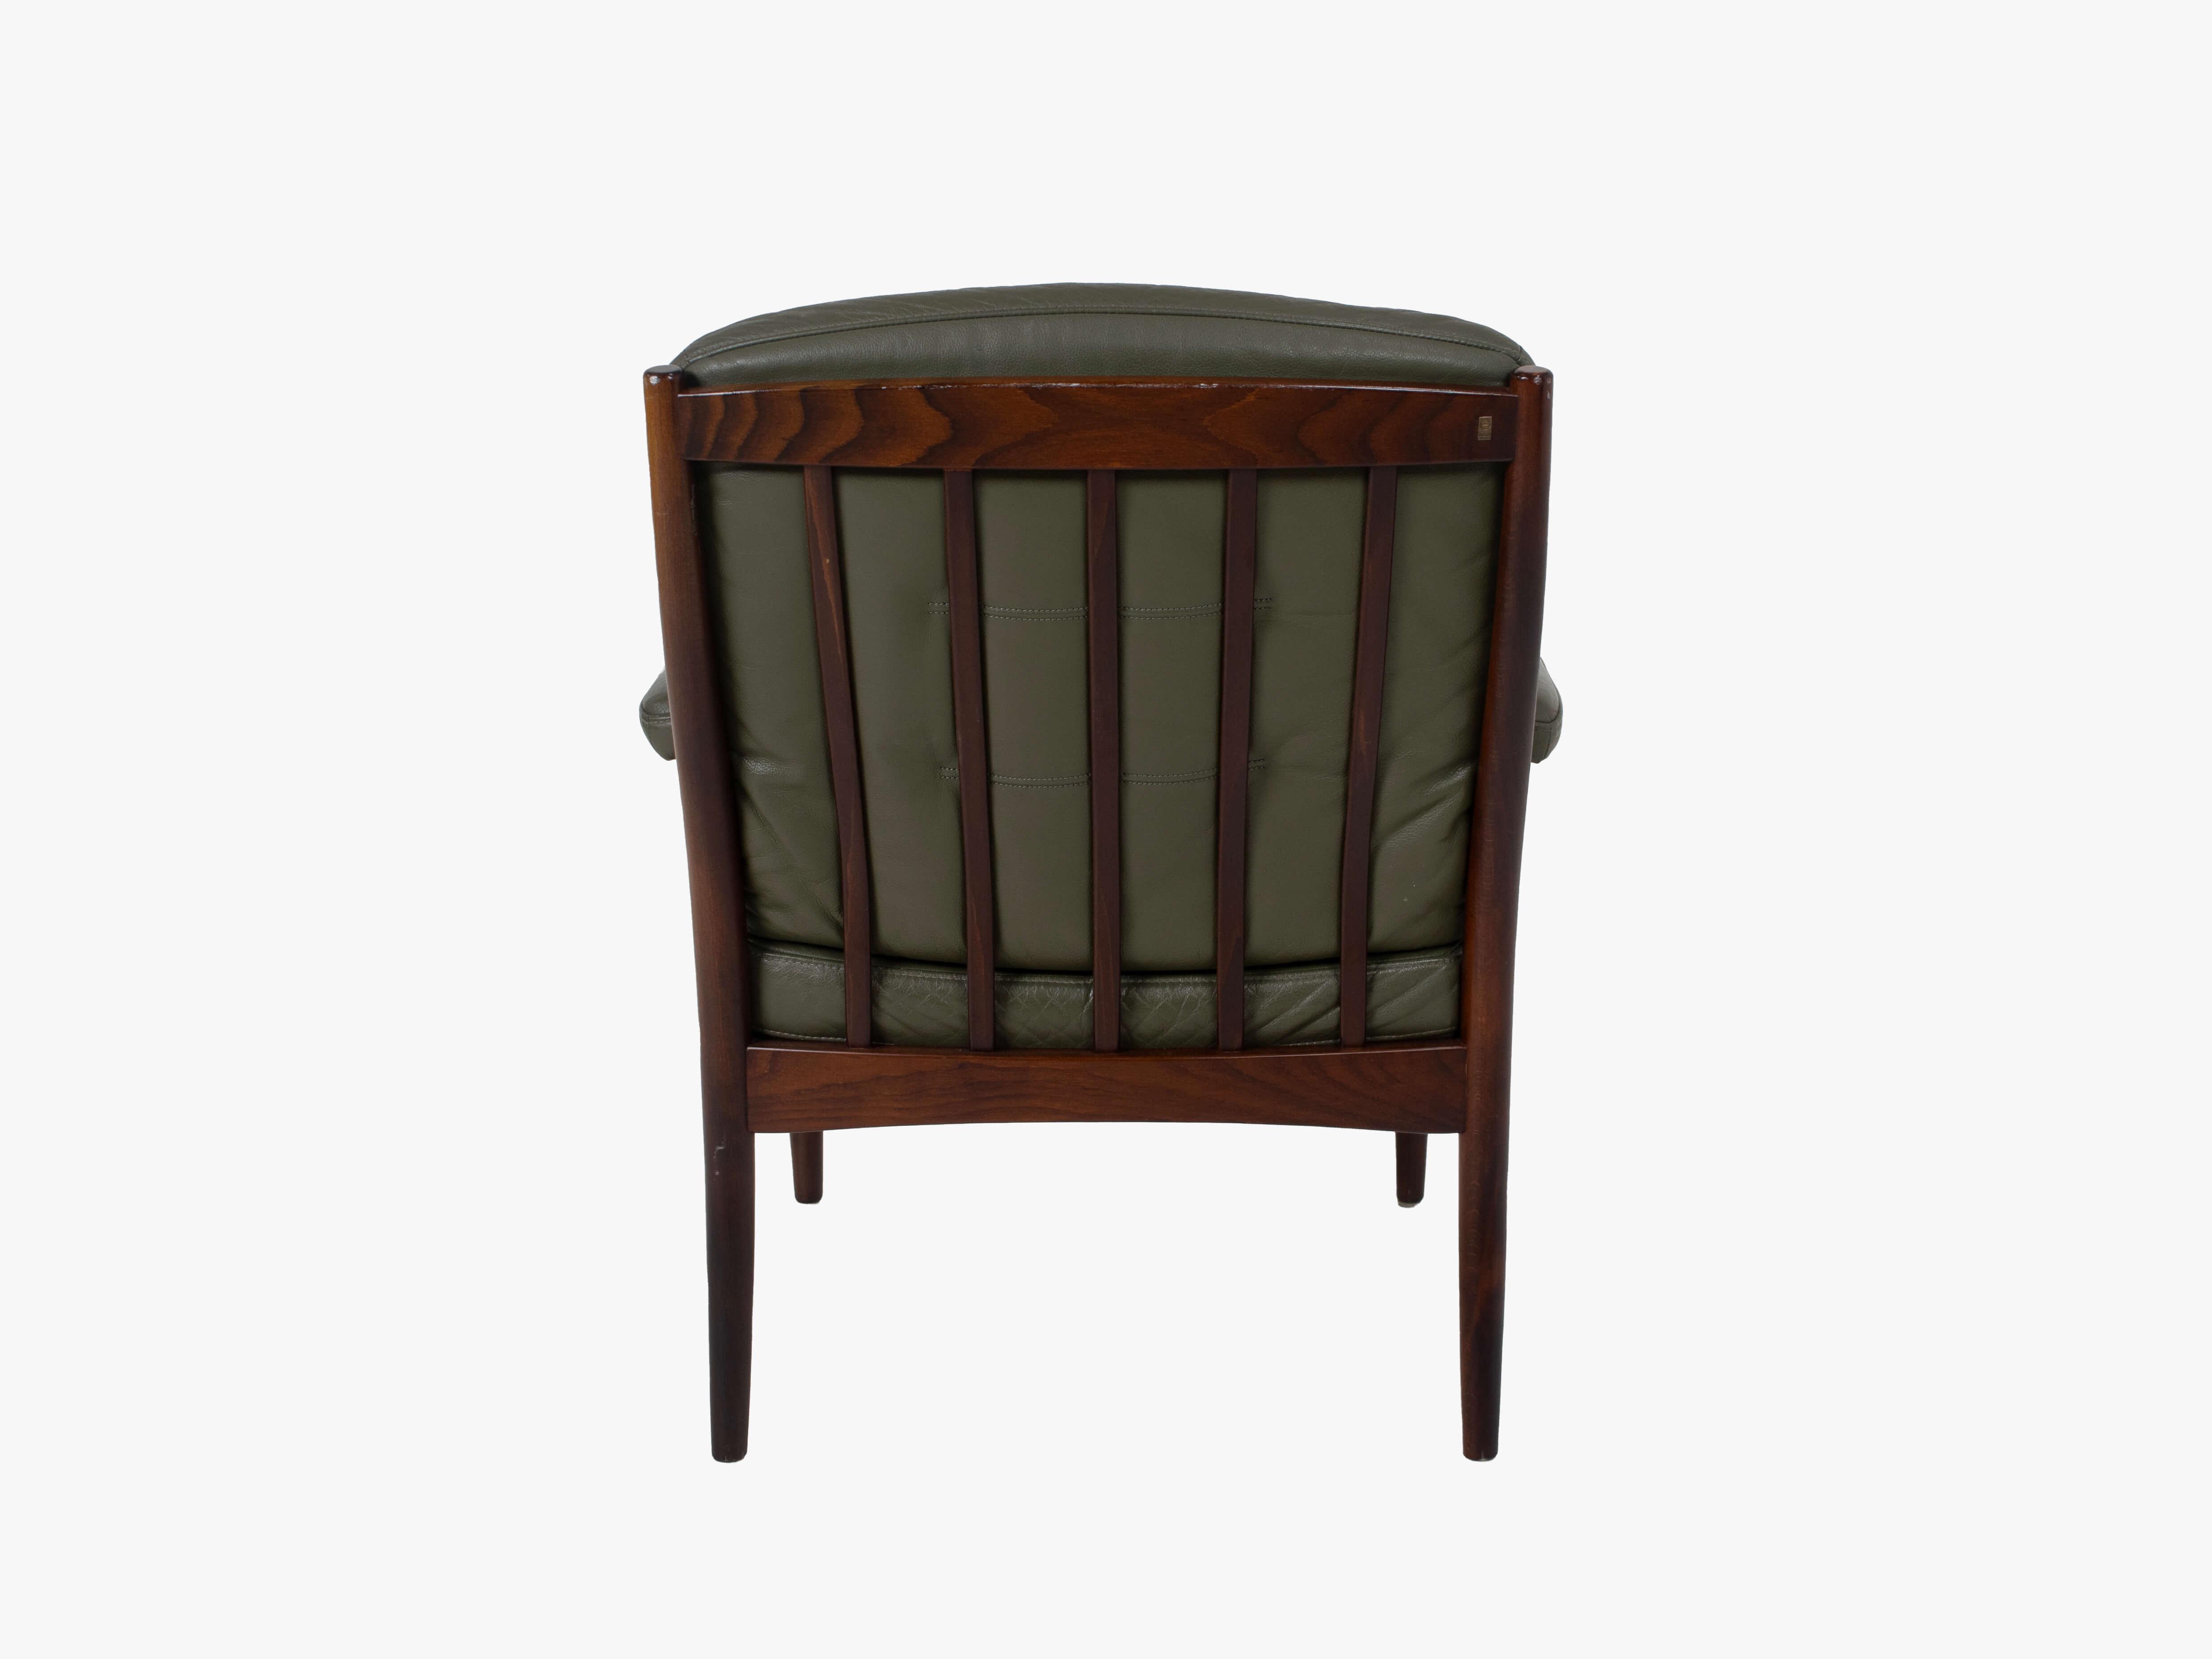 Back view G-Mobel Easy Chair in Green Leather for Göte Möbler, Sweden 1970s